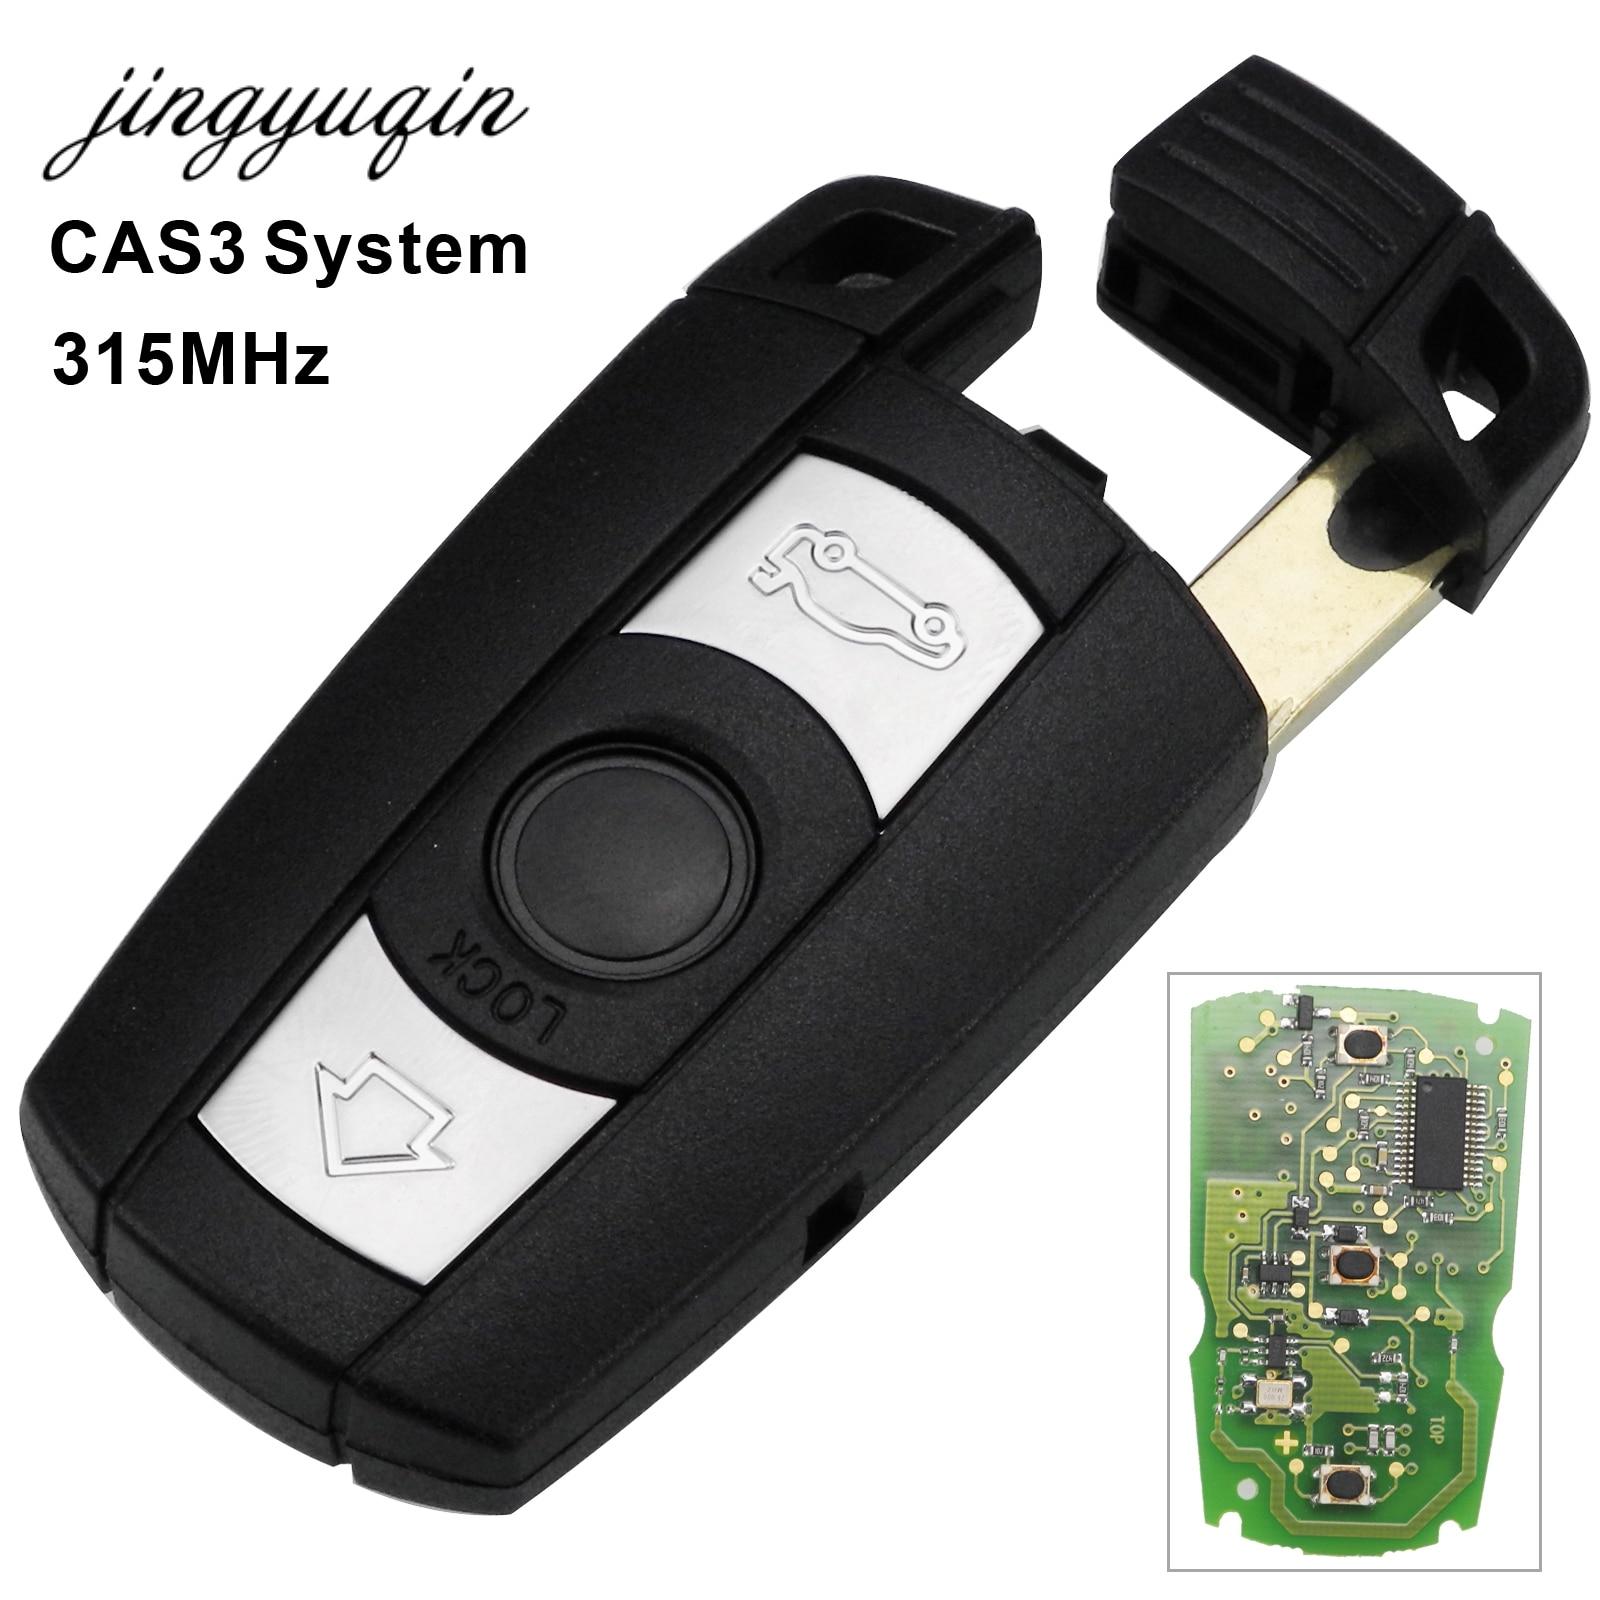 jingyuqin Car Remote Smart Key DIY for BMW CAS3 X5 X6 Z4 1/3/5/7 Series 315MHz ID46 Keyless Entry Transmitter